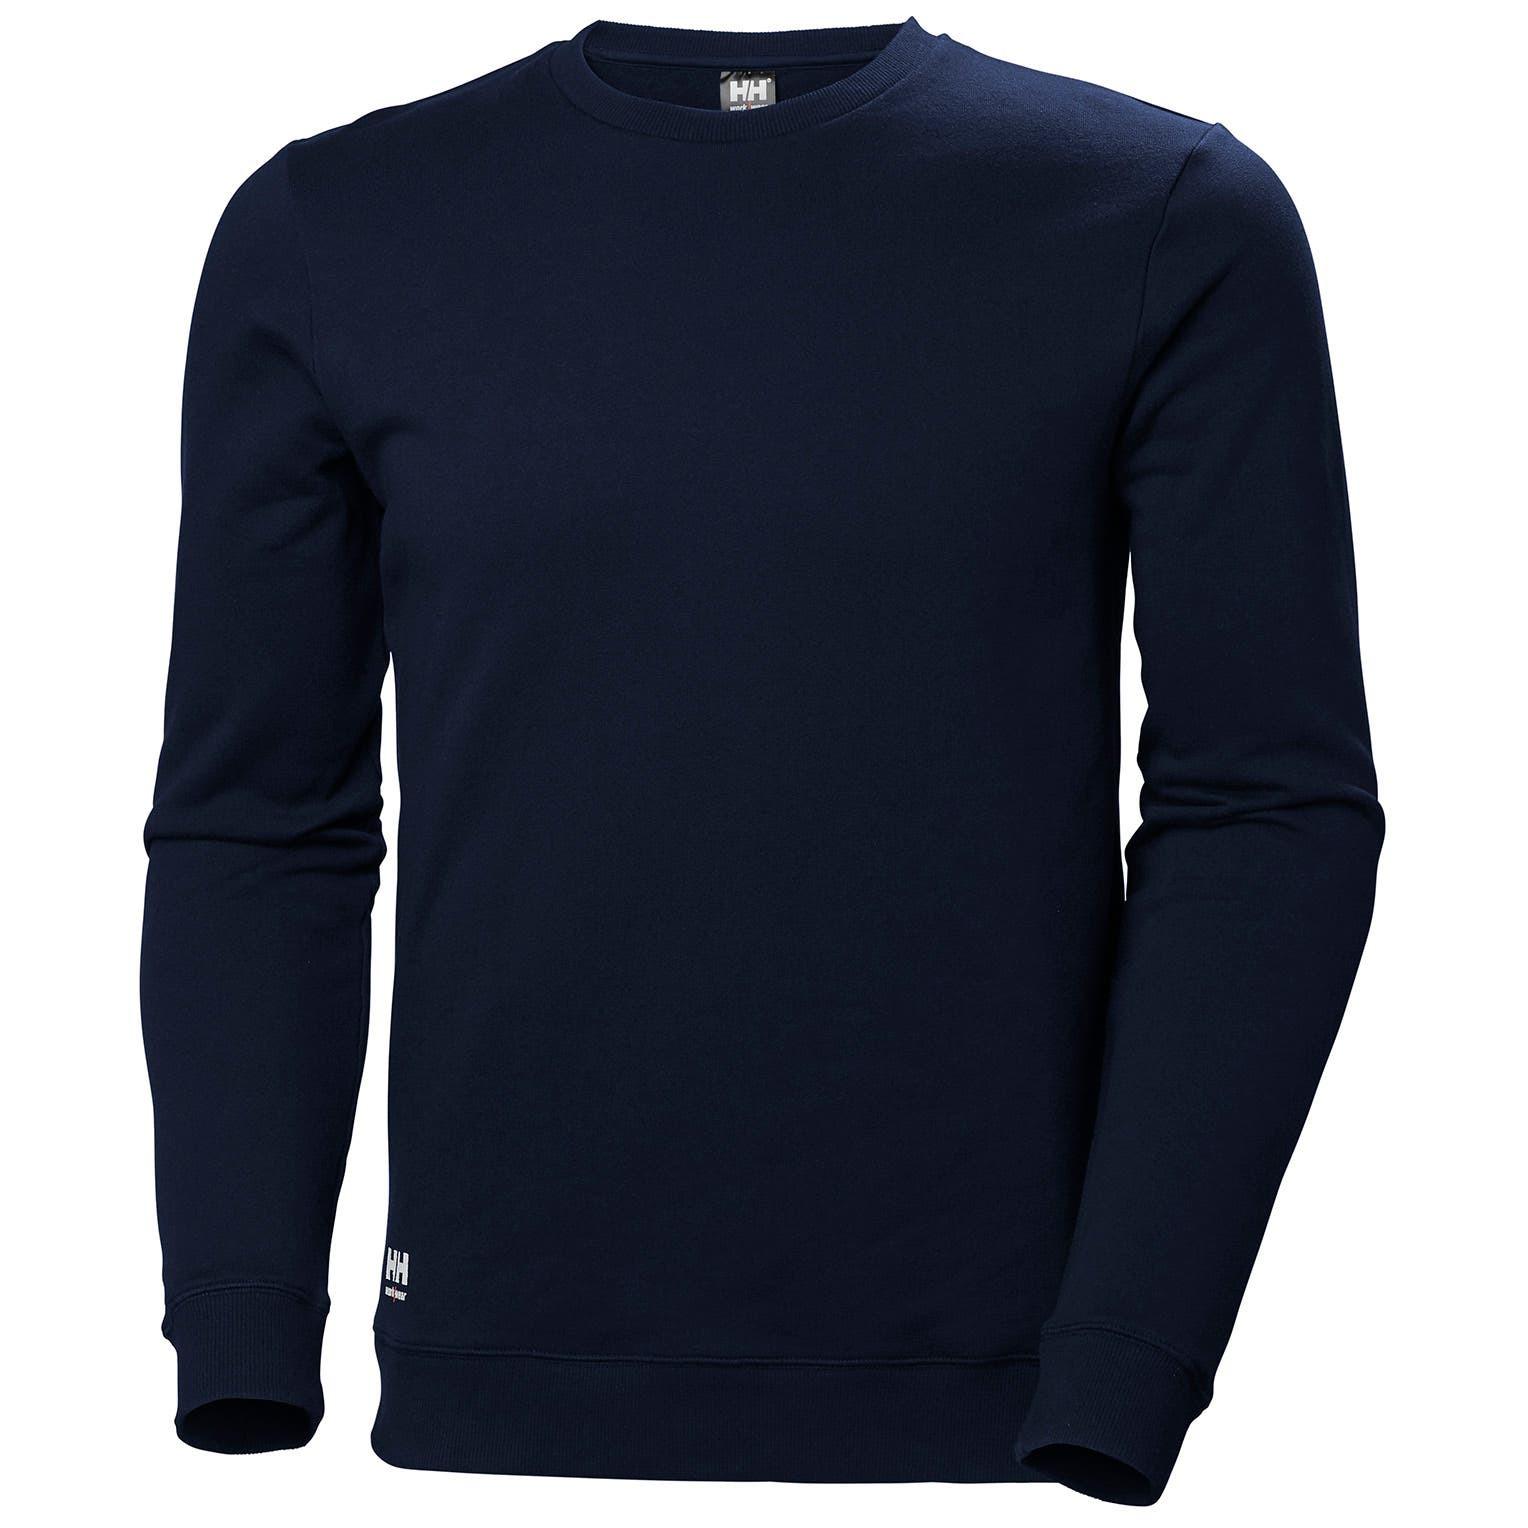 Свитшот Helly Hansen Manchester Sweatshirt - 79208 (Navy; L)